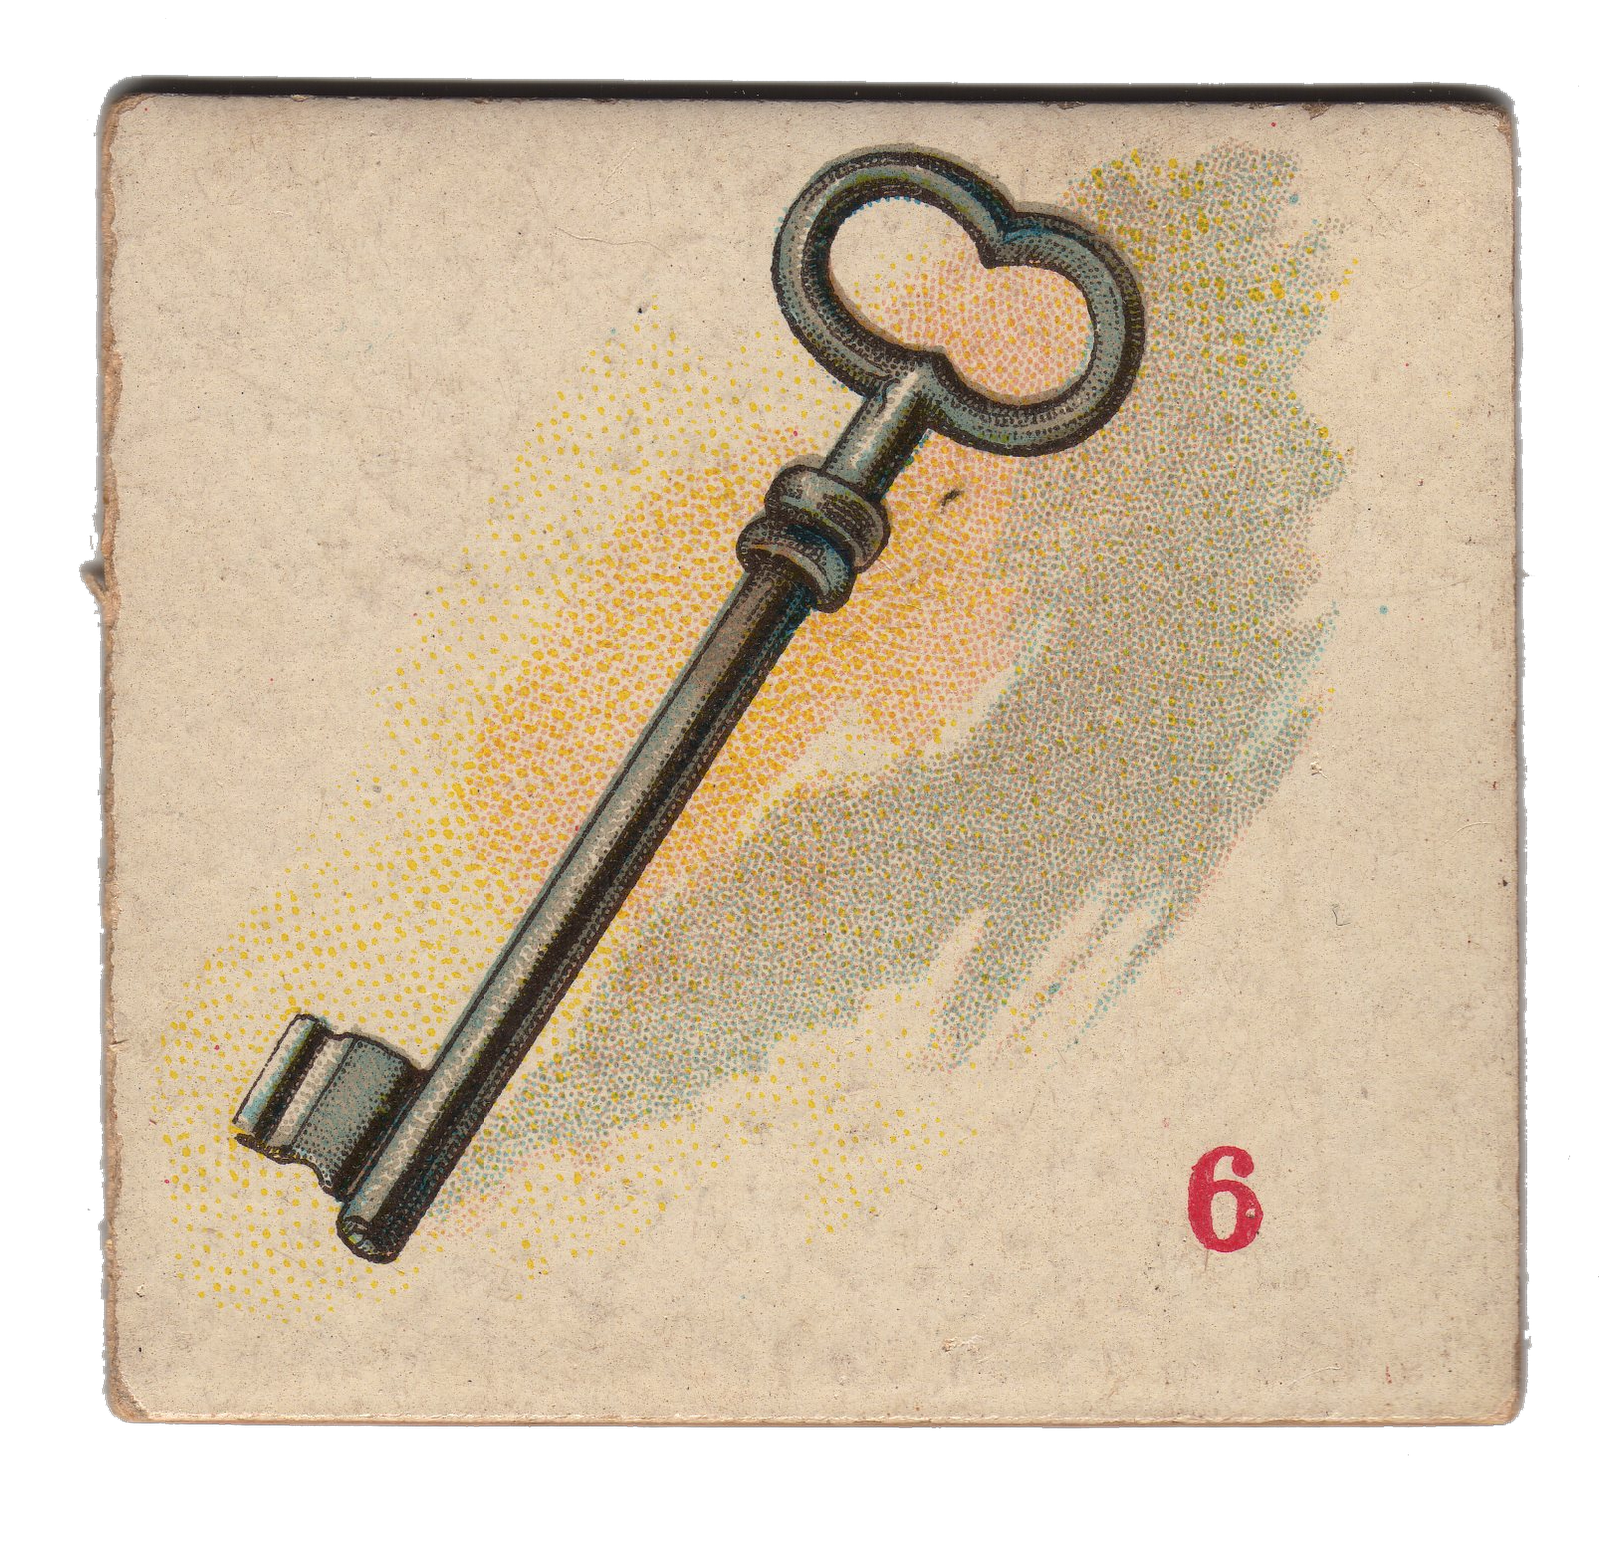 Free Vintage Clip Art - Skeleton Key - The Graphics Fairy